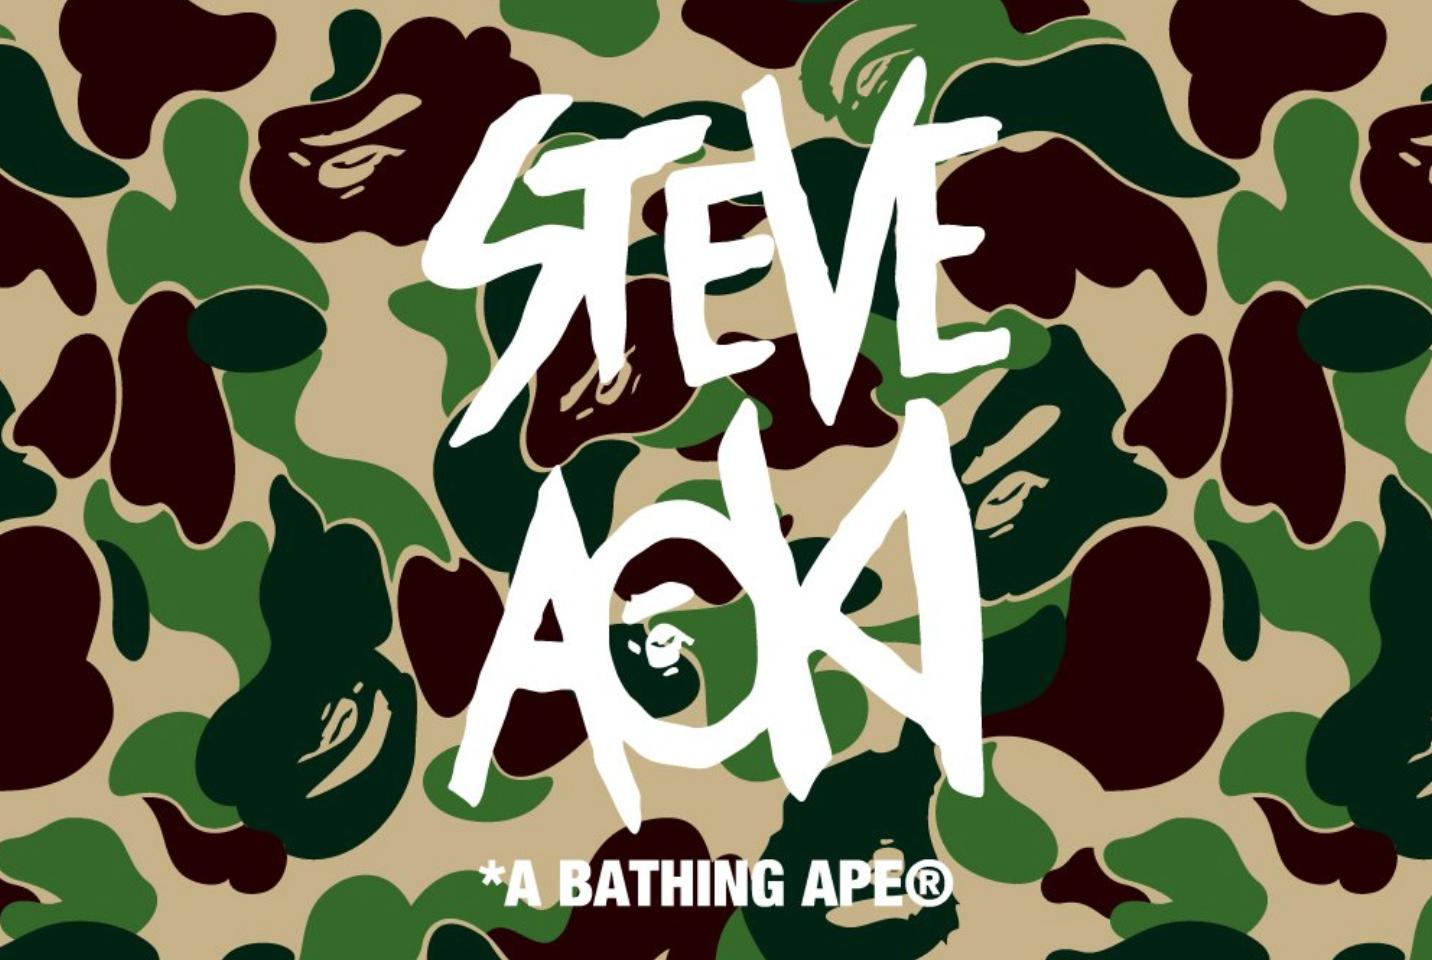 A BATHING APE® x STEVE AOKI 8/18(土) 発売予定